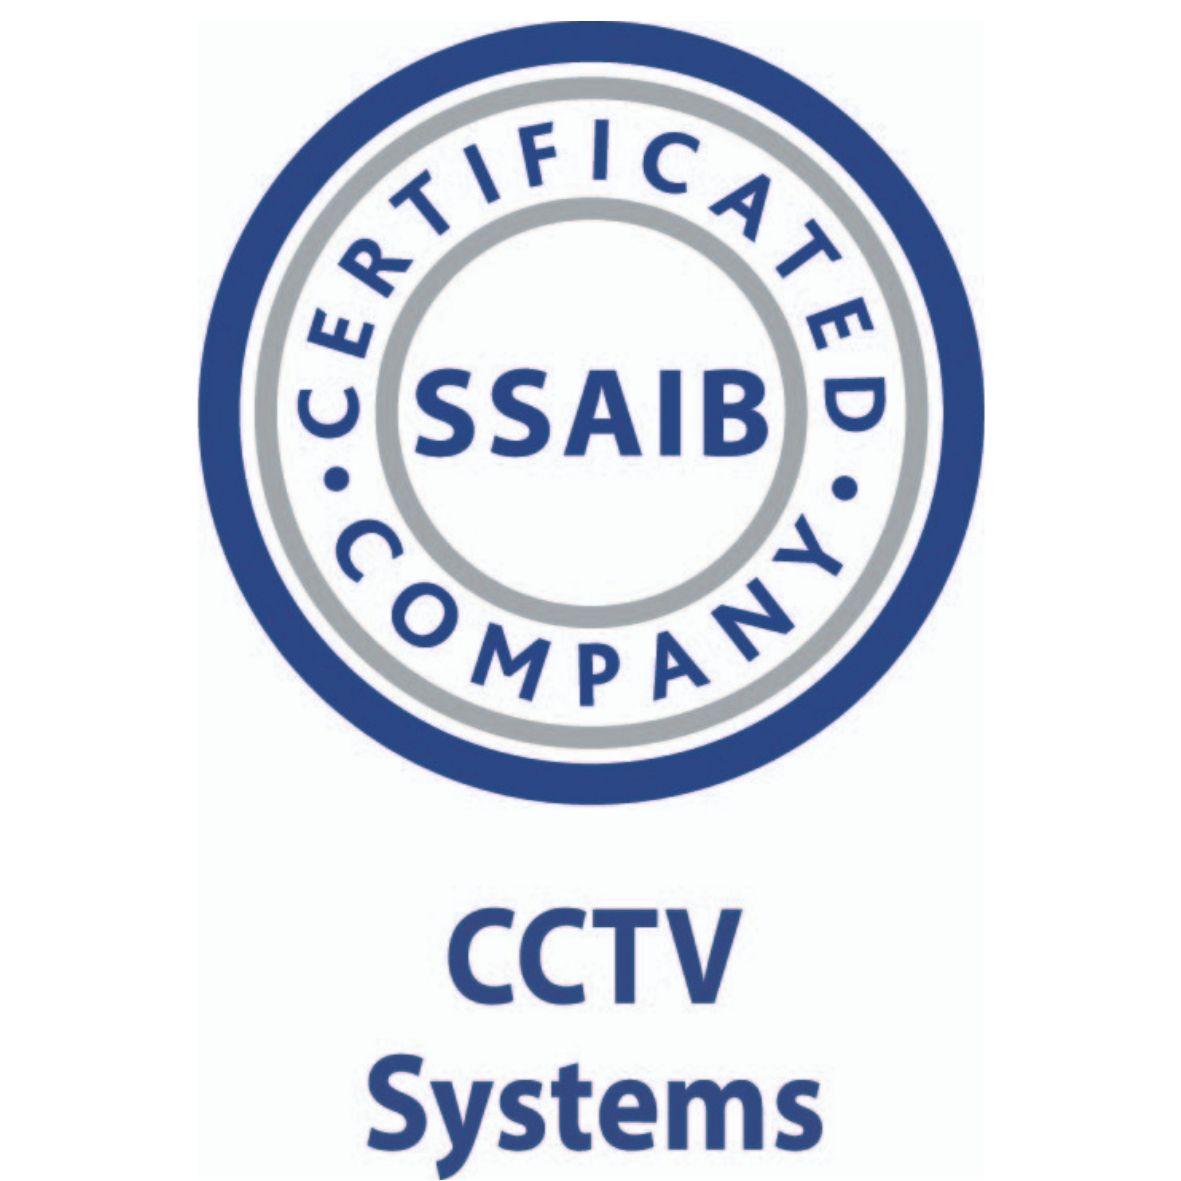 SSAIB CCTV Systems Logo